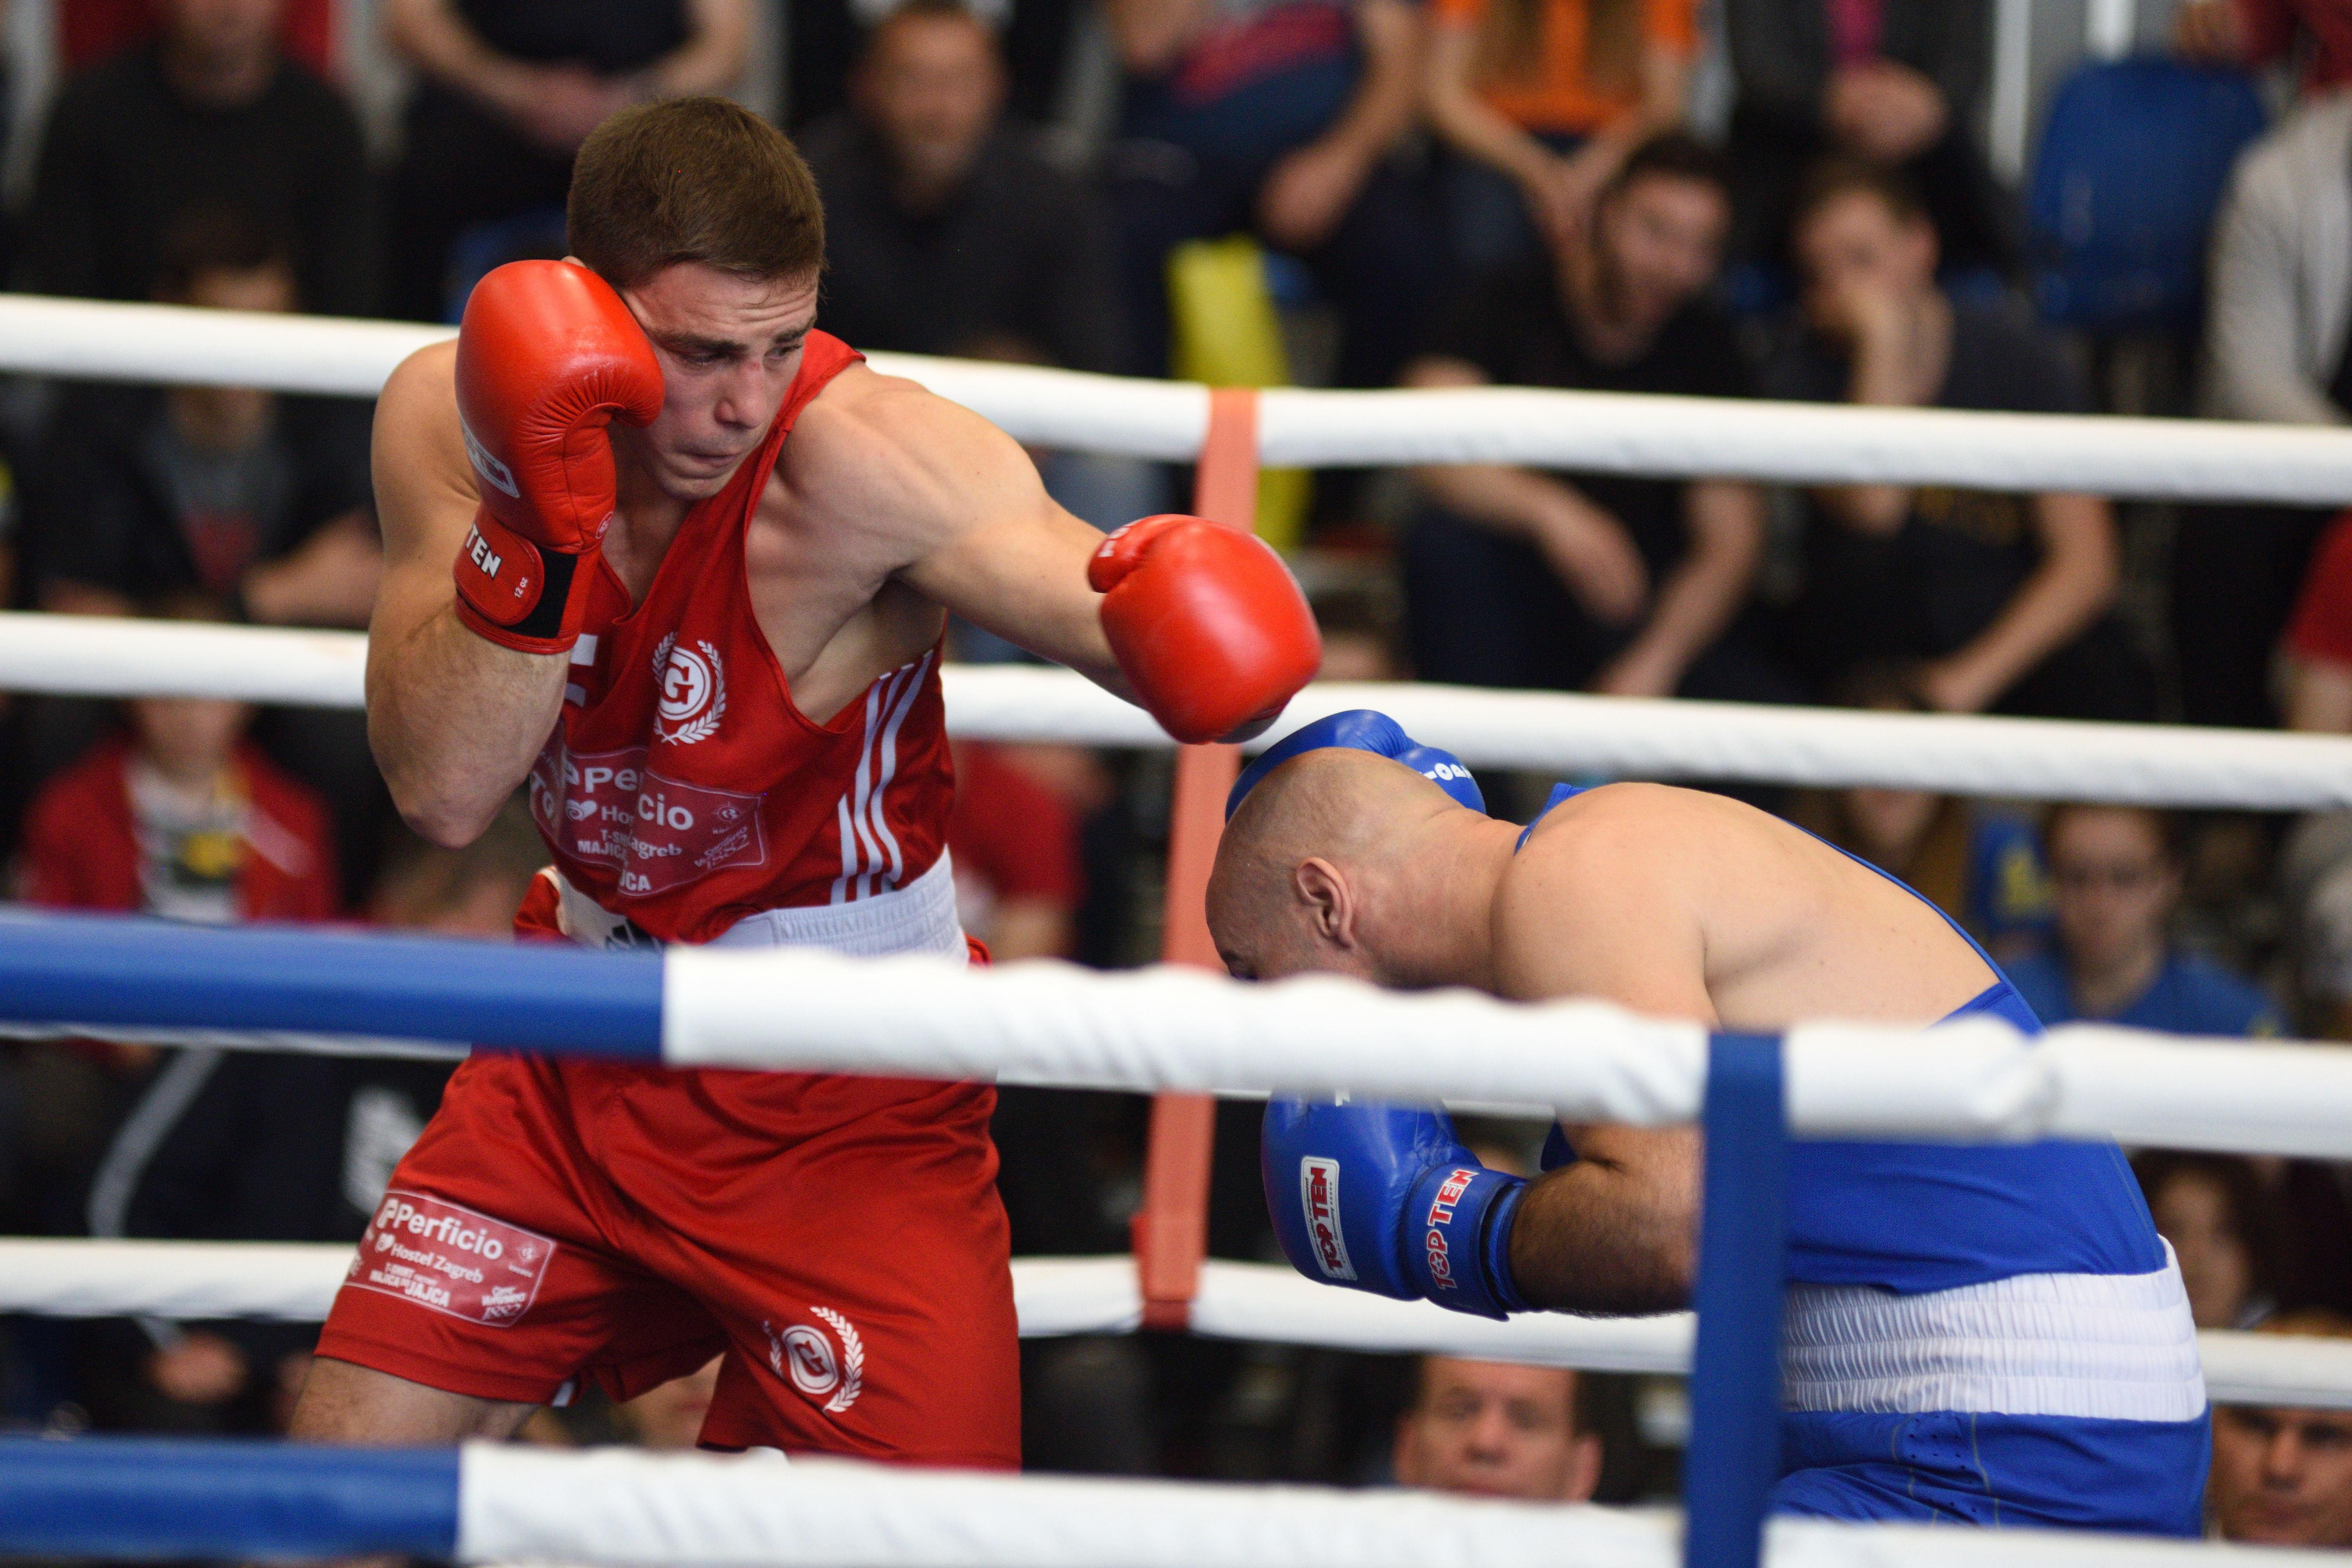 Ugovorni pričuvnik HV-a Toni Filipi obranio naslov prvaka Hrvatske u teškoj kategoriji